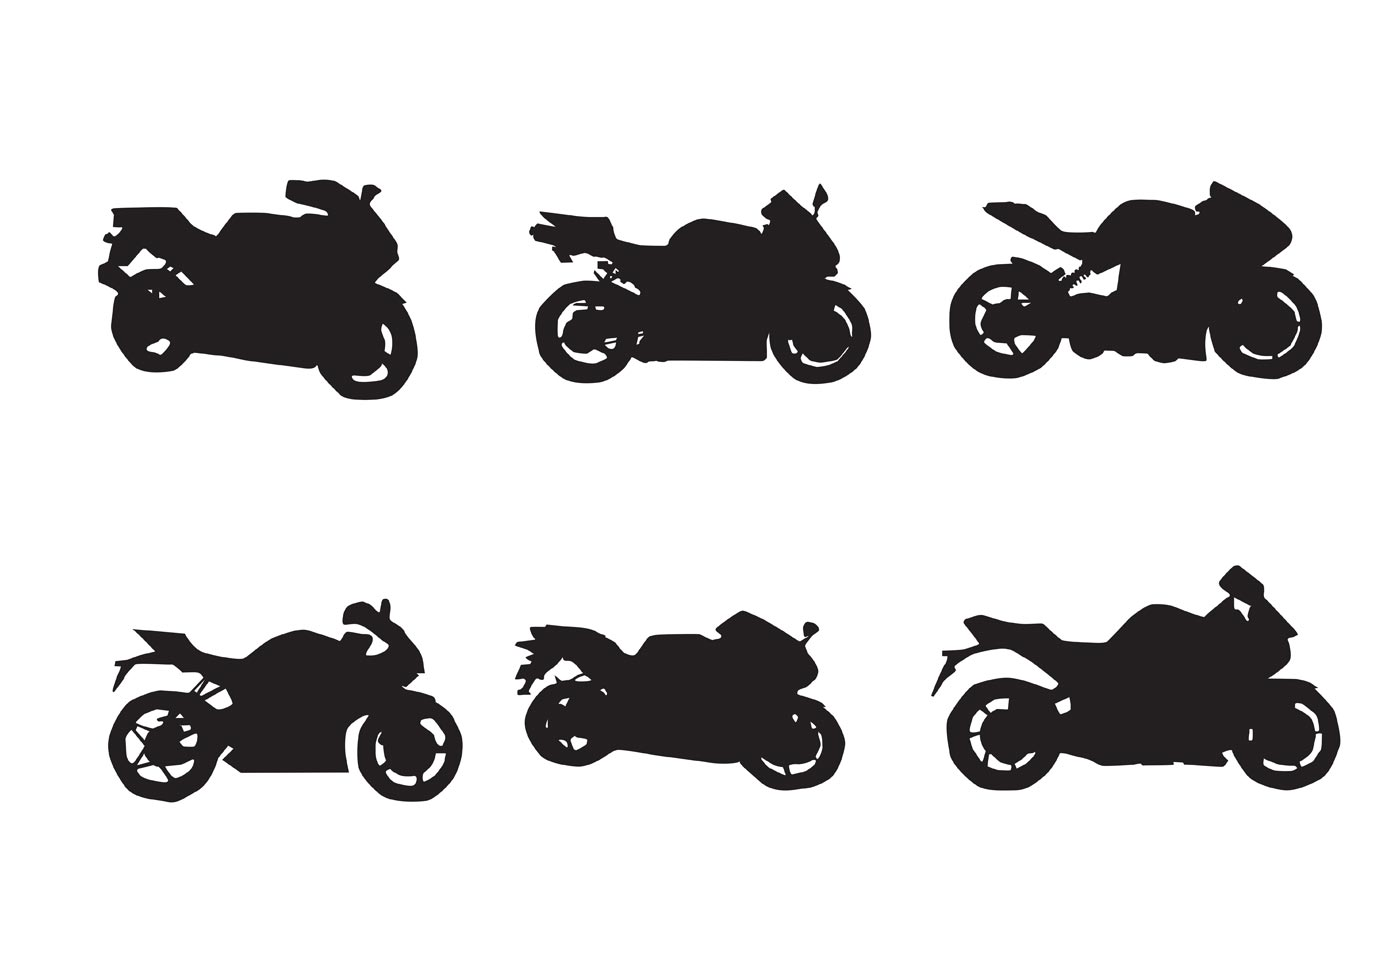 1400x980 Moto Free Vector Art